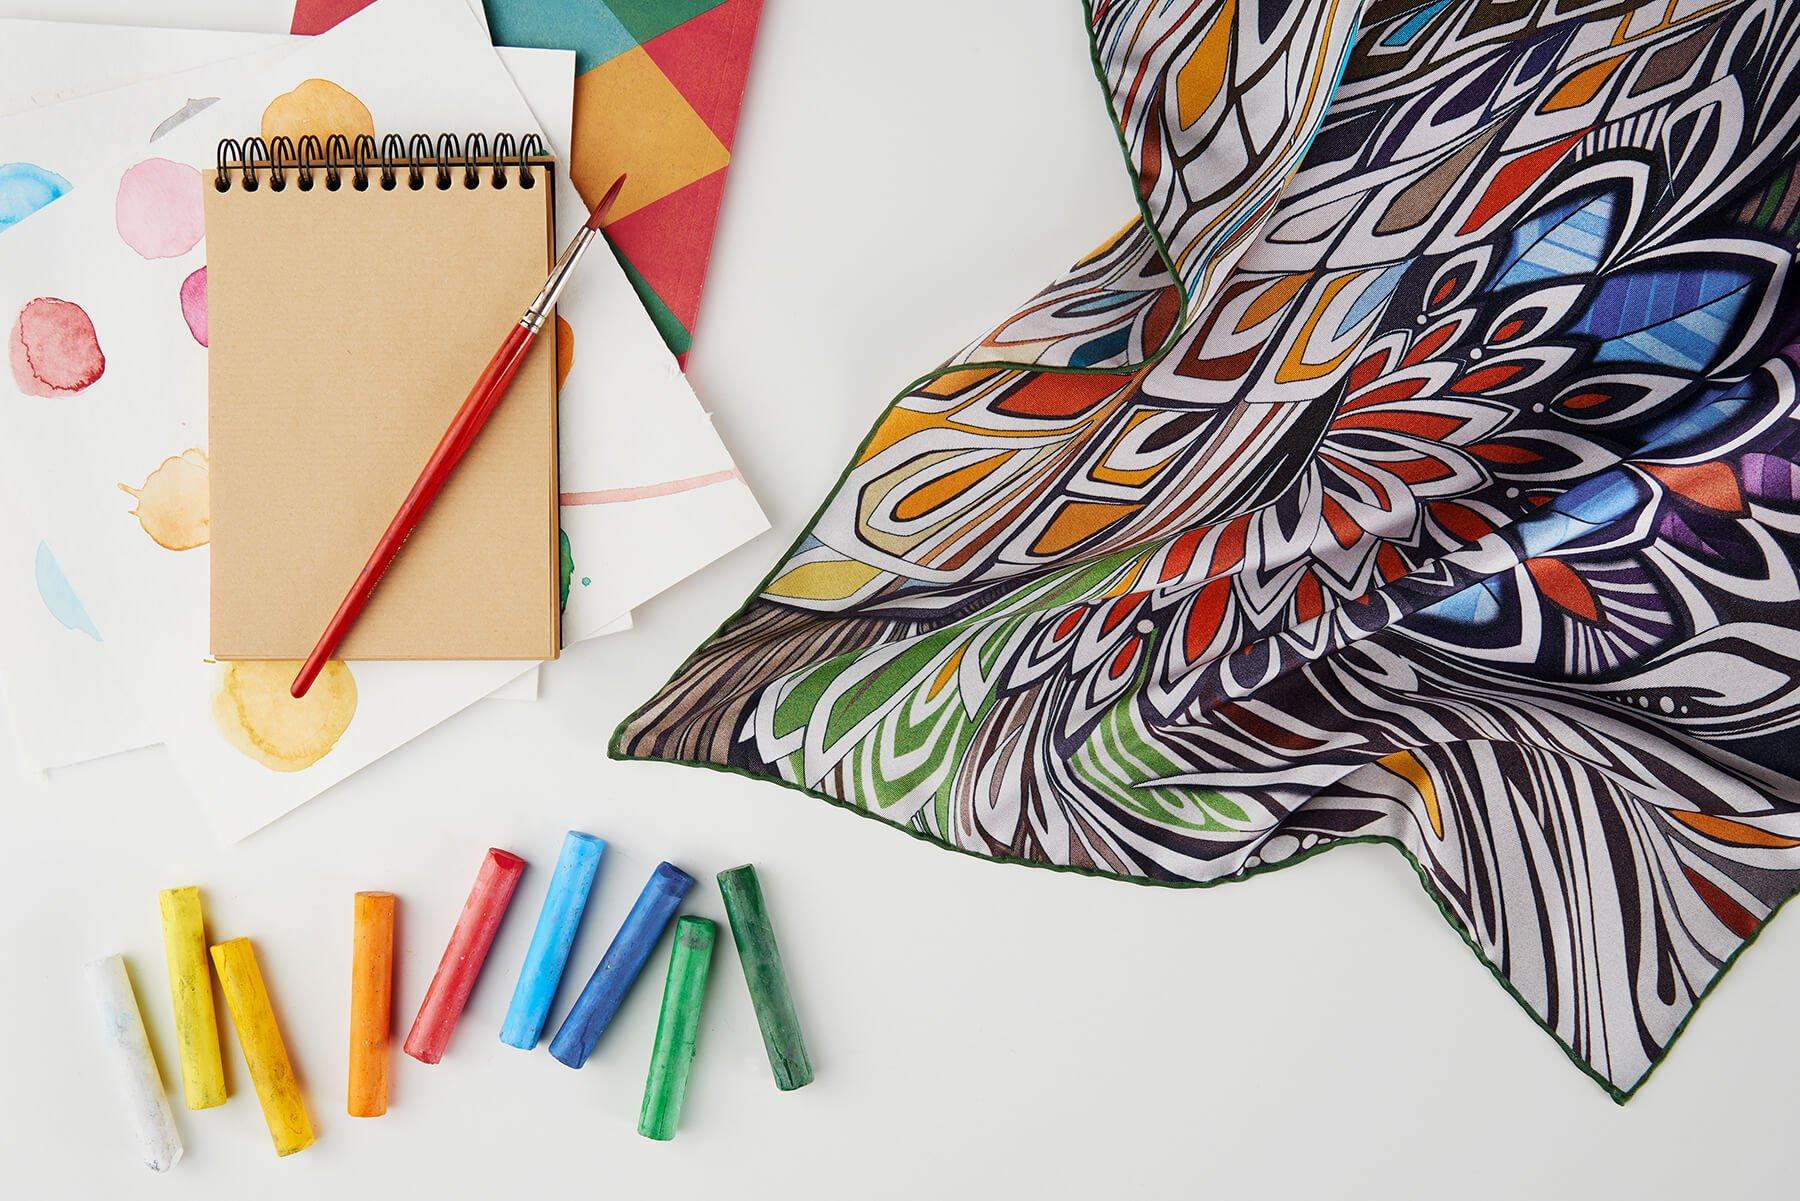 R. Culturi Colorful Wind Pocket Square